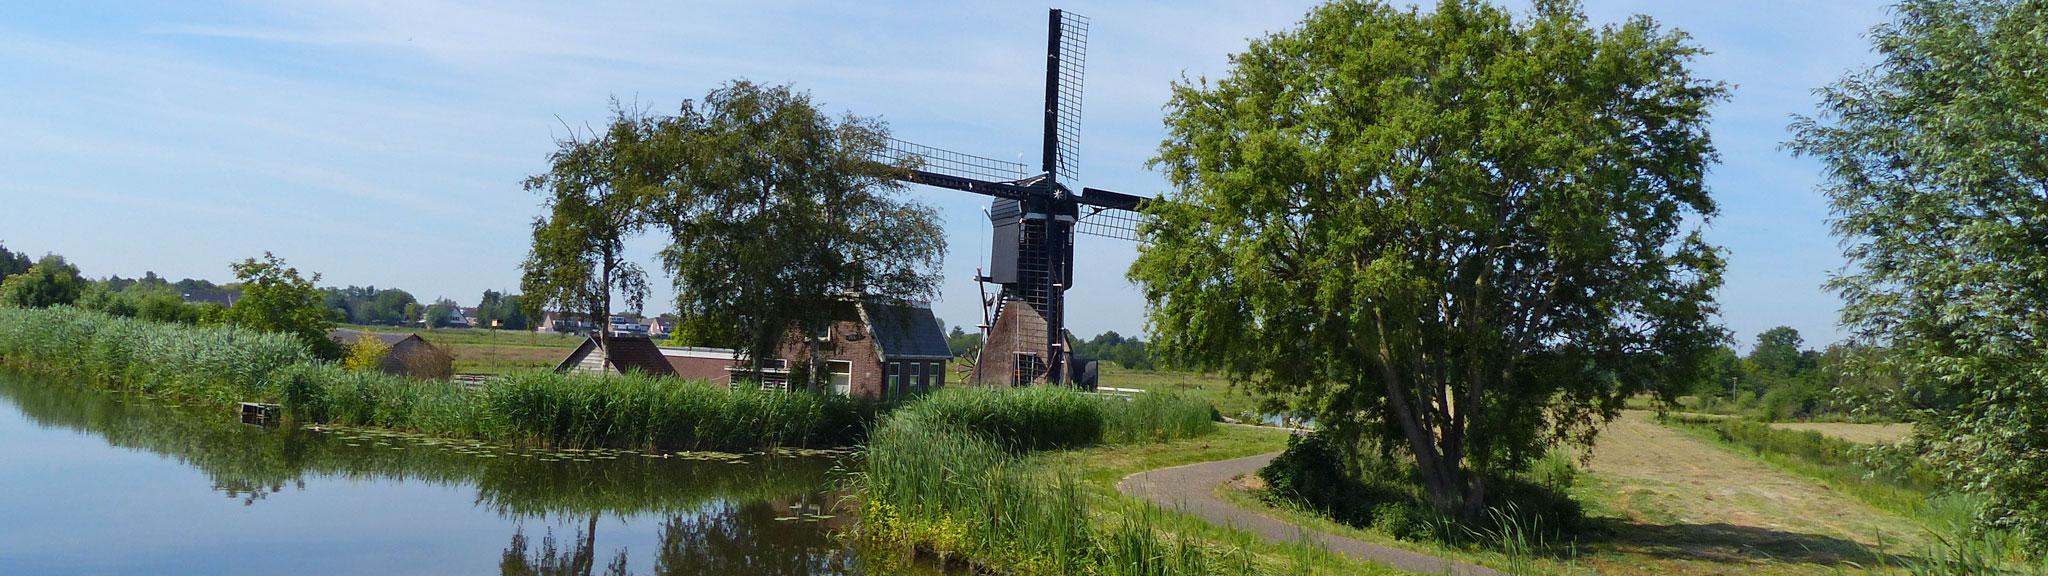 Hausboot mieten in Holland